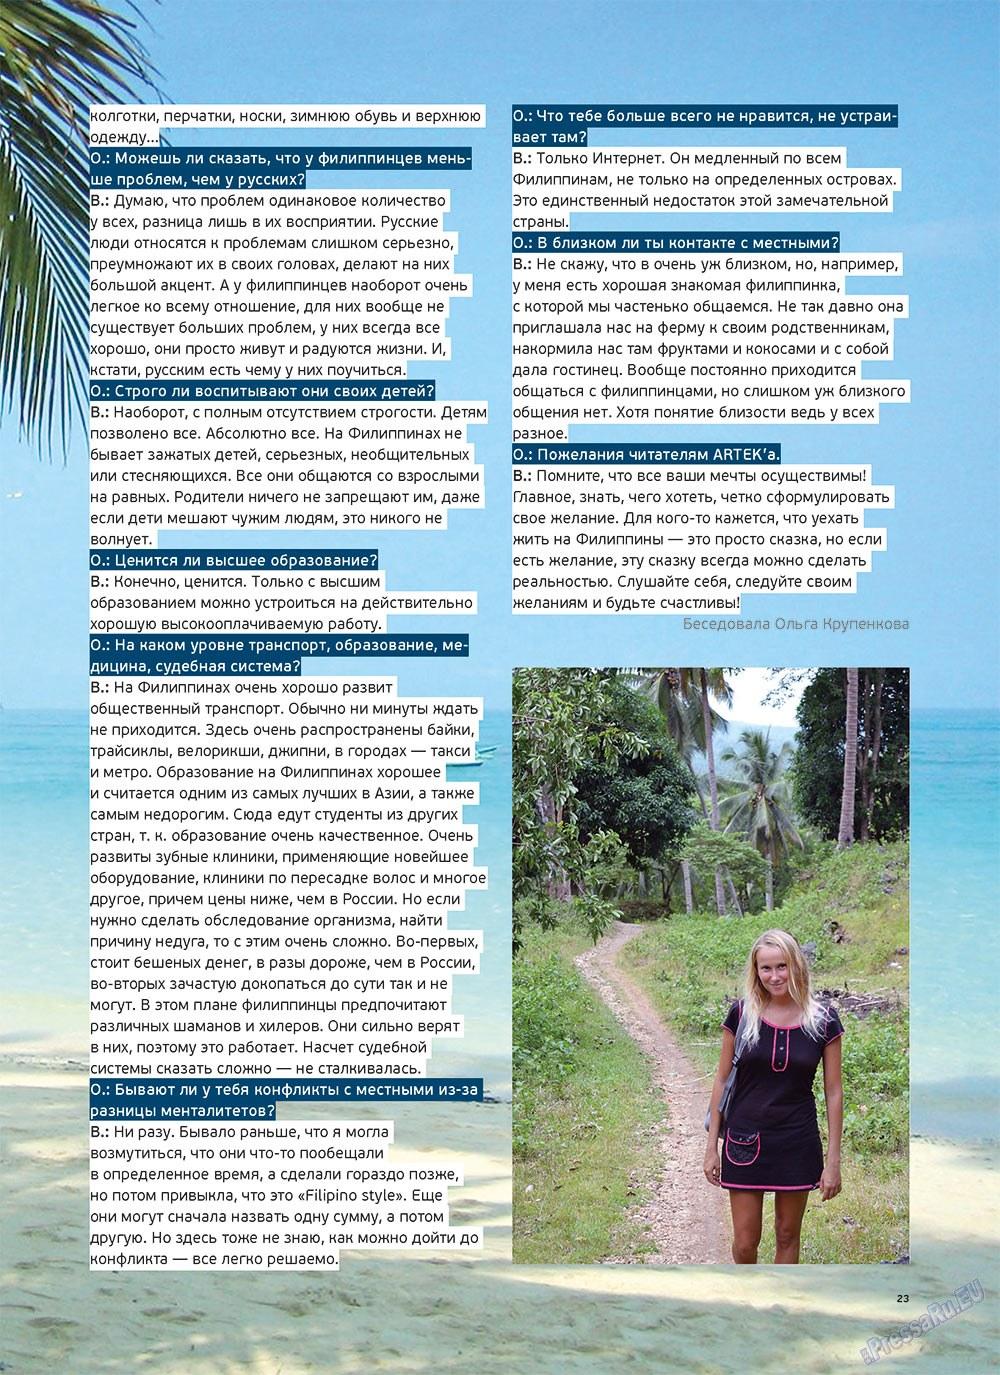 Артек (журнал). 2012 год, номер 5, стр. 25